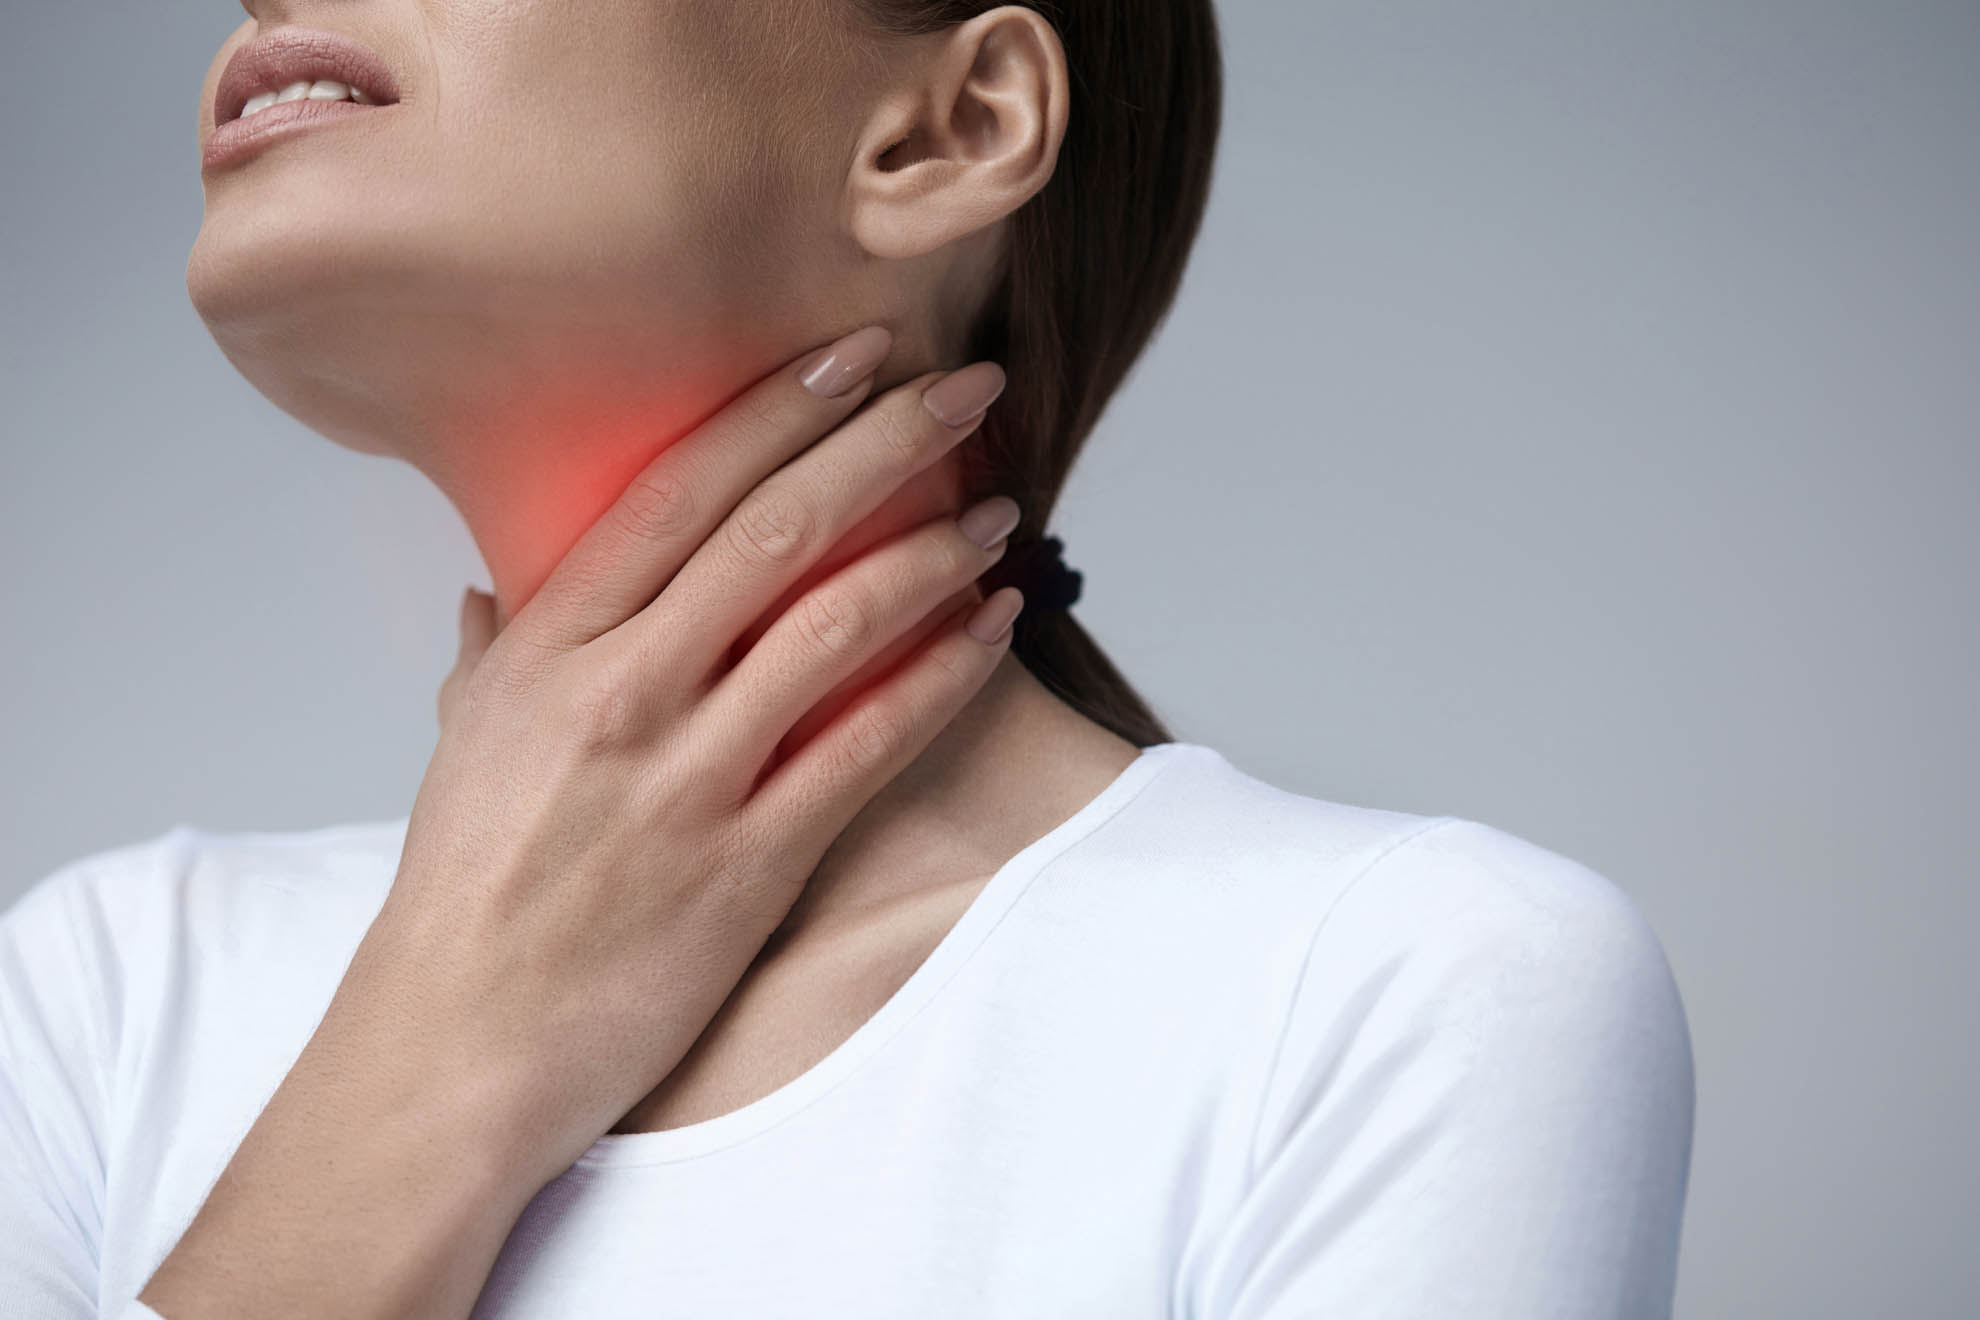 Adult severe sore throat pain